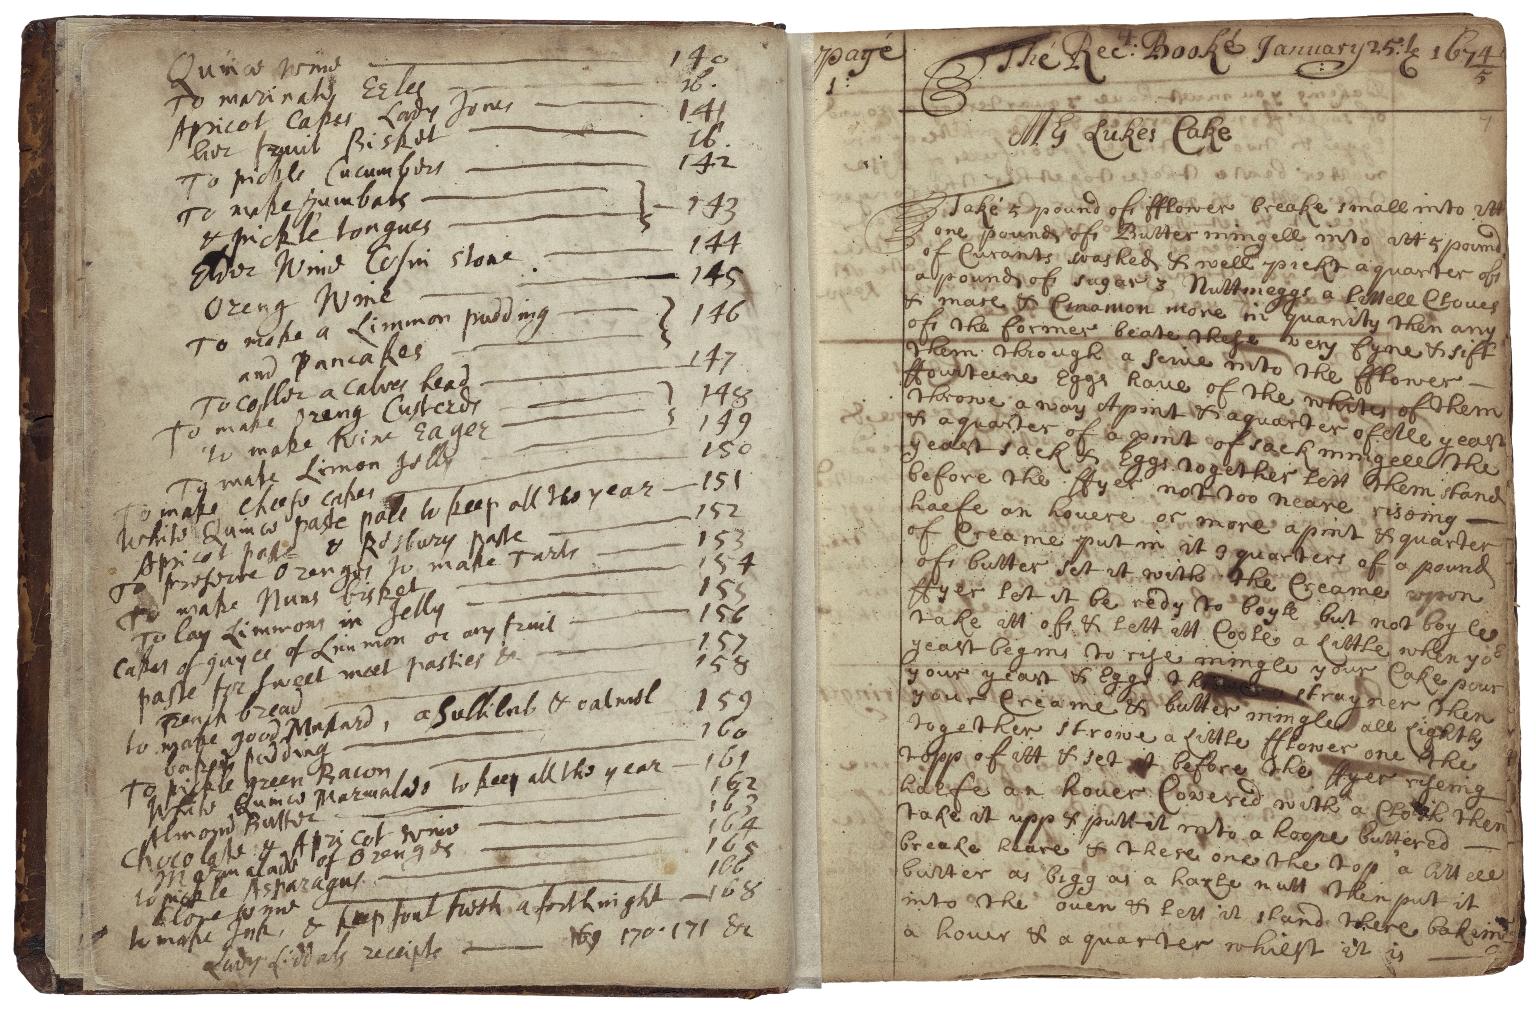 Receipt book of Penelope Jephson [manuscript].